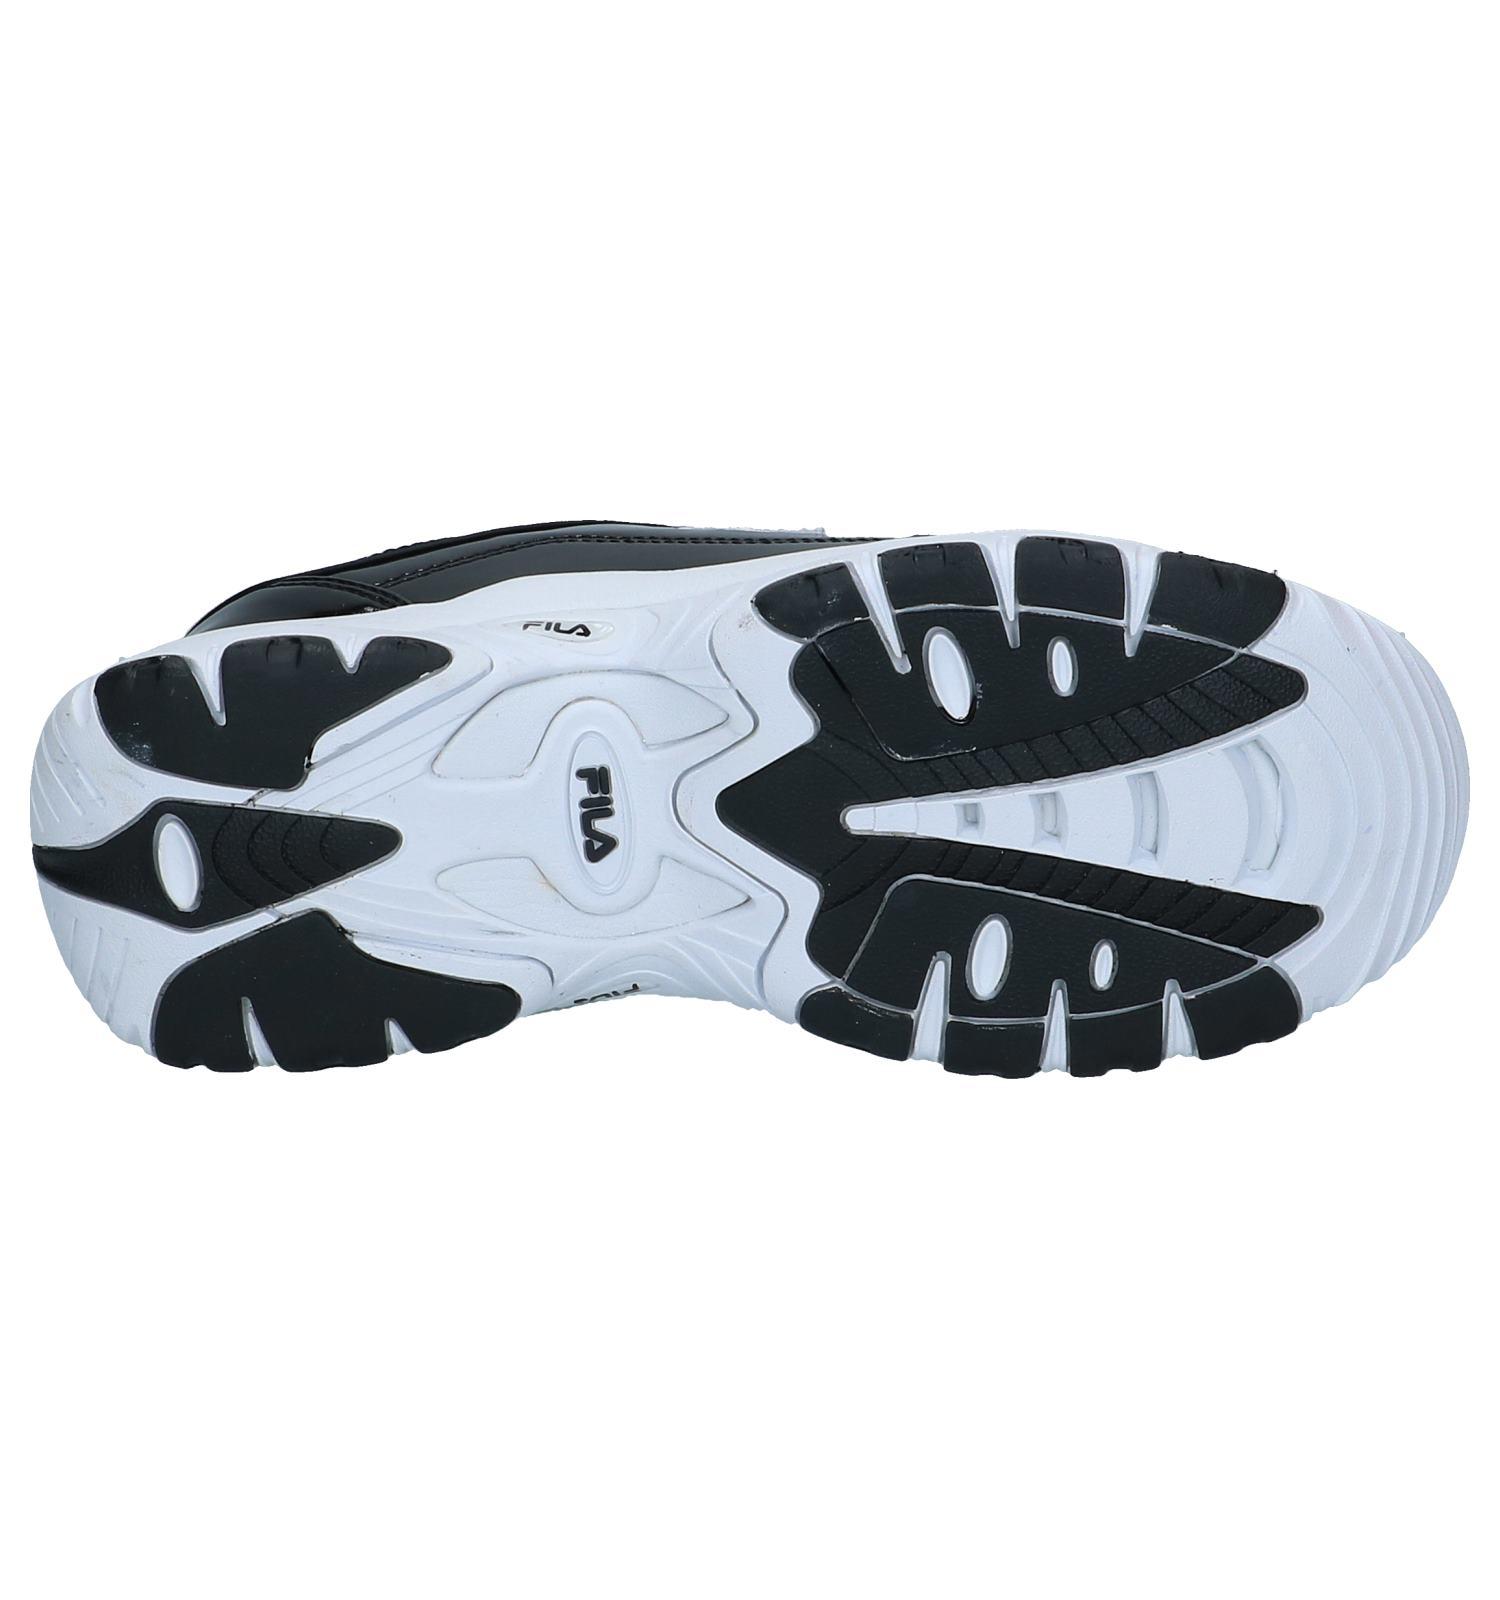 Fila Strada Zwarte Lage Sneakers | SCHOENENTORFS.NL | Gratis